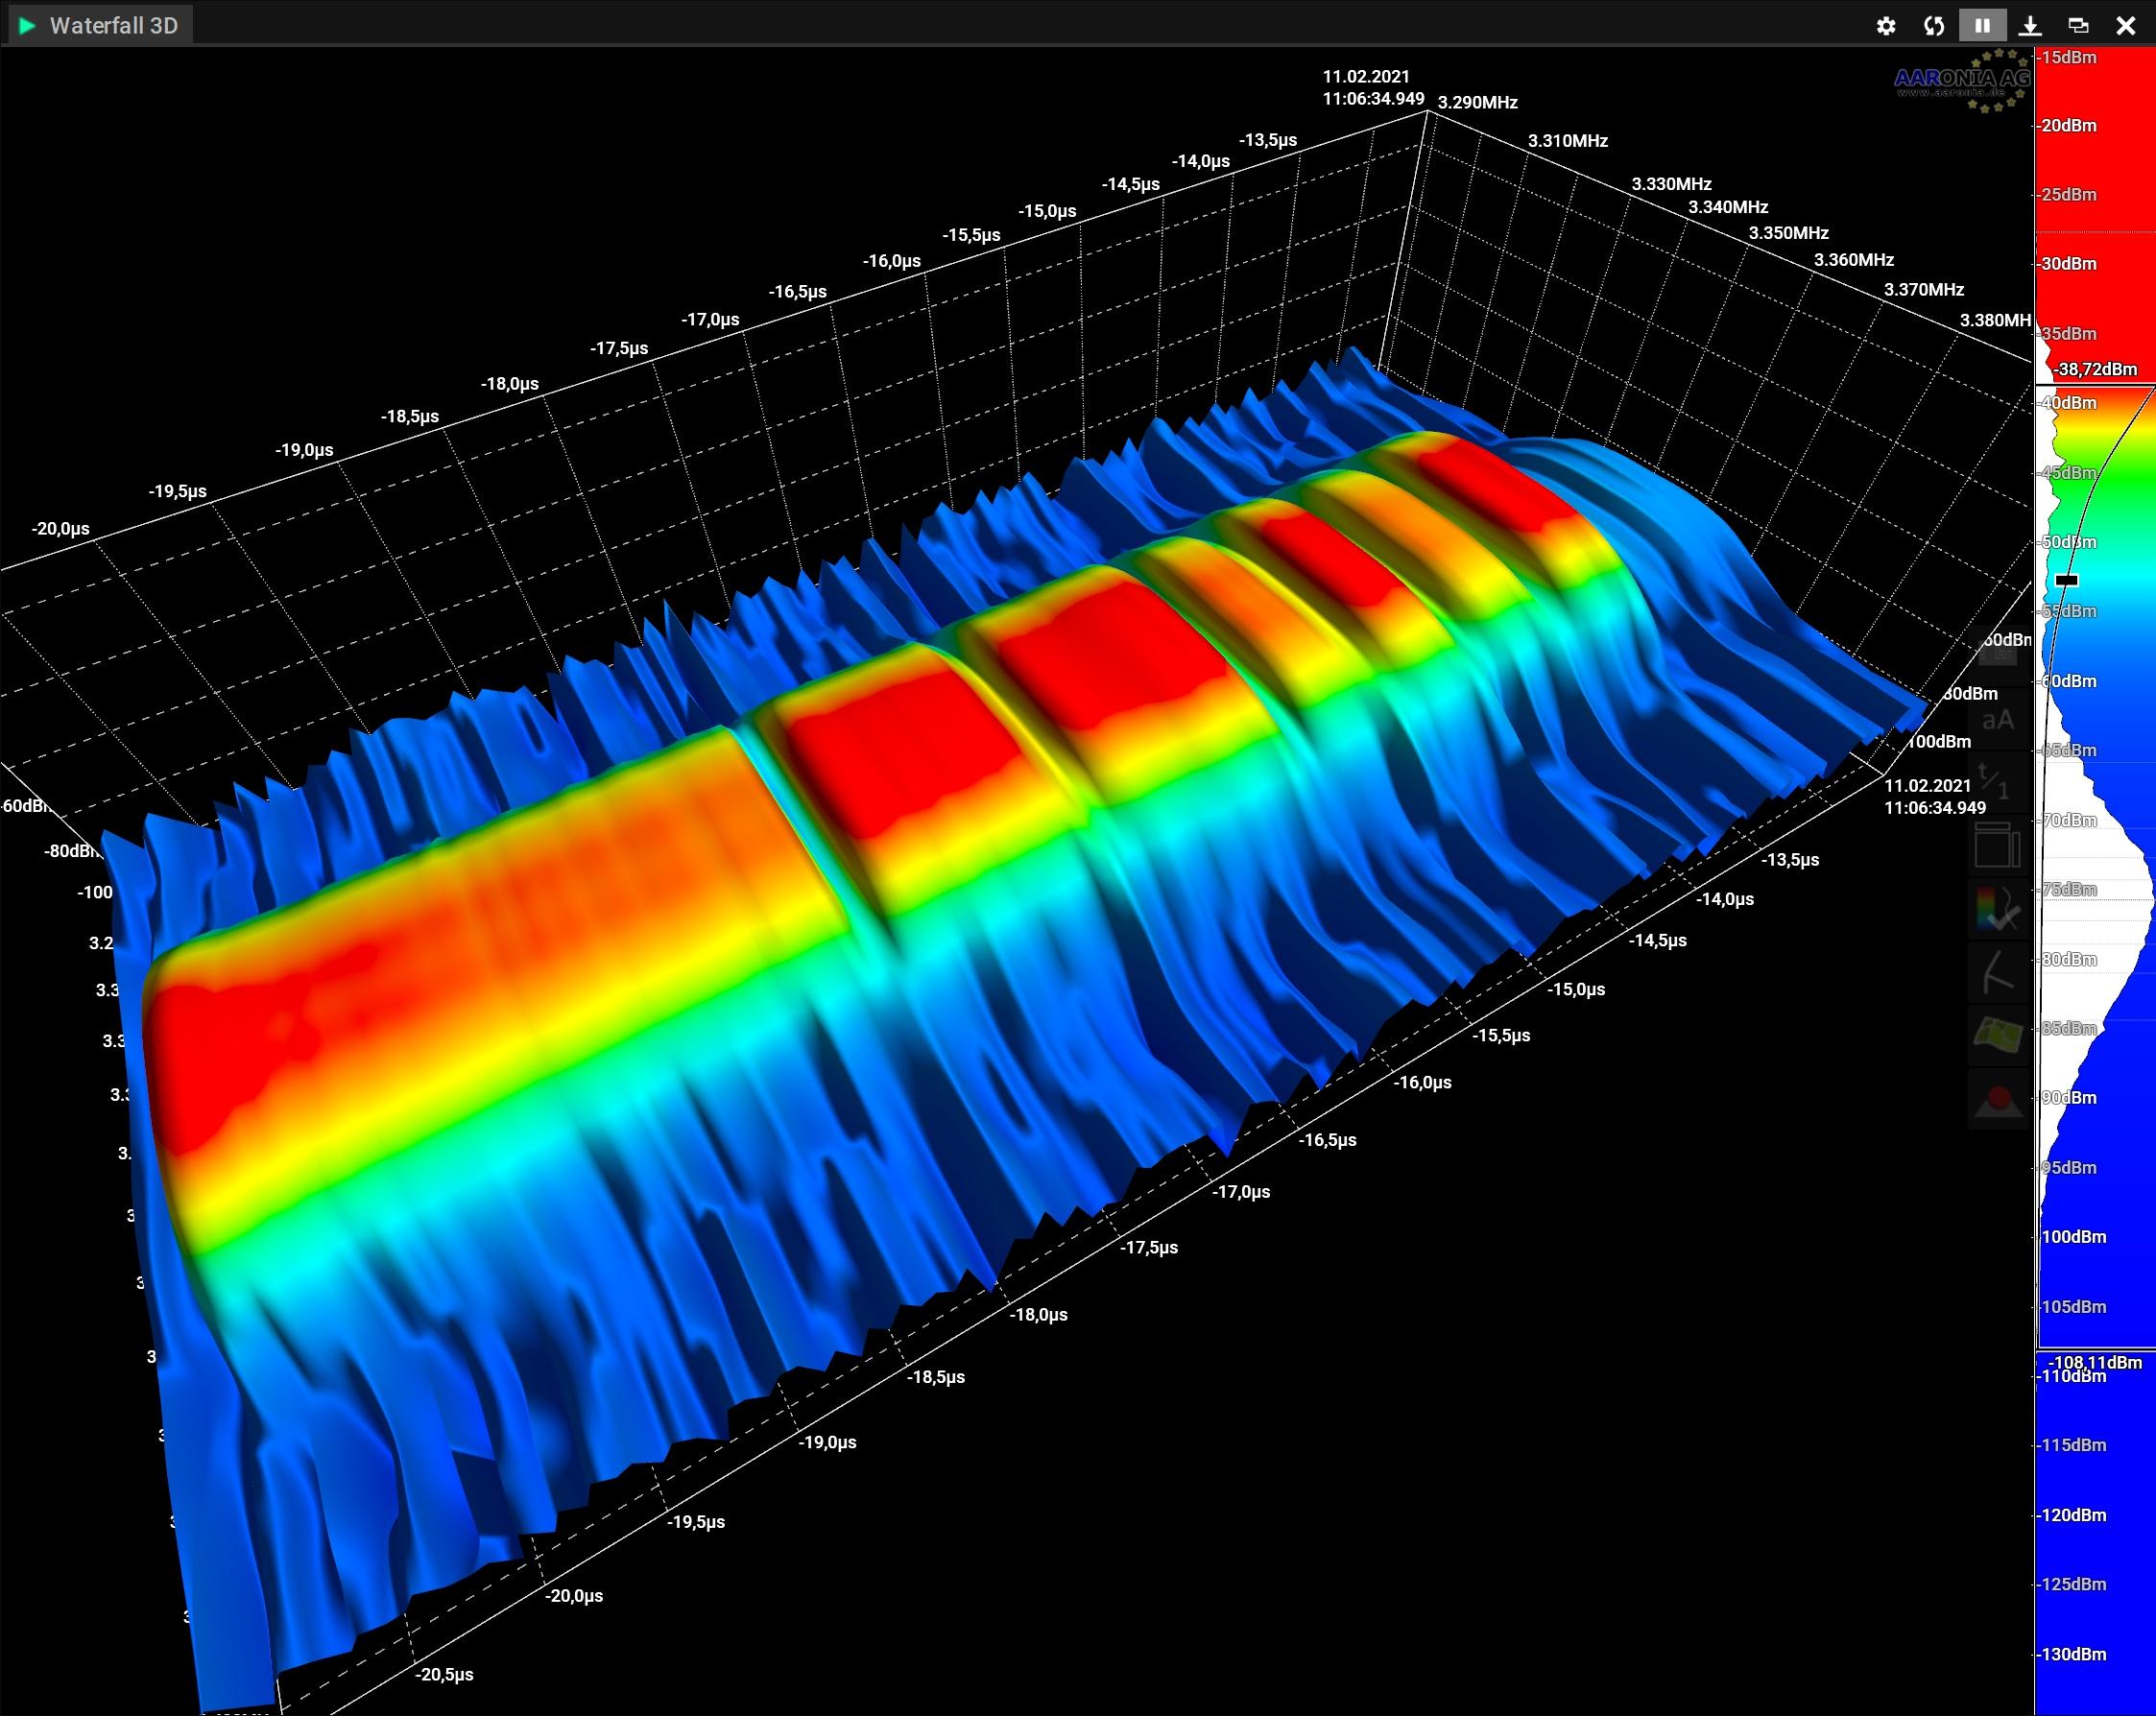 3D_Doppler_Radar_Spectrum_showing_a_Barker_Code_of_13